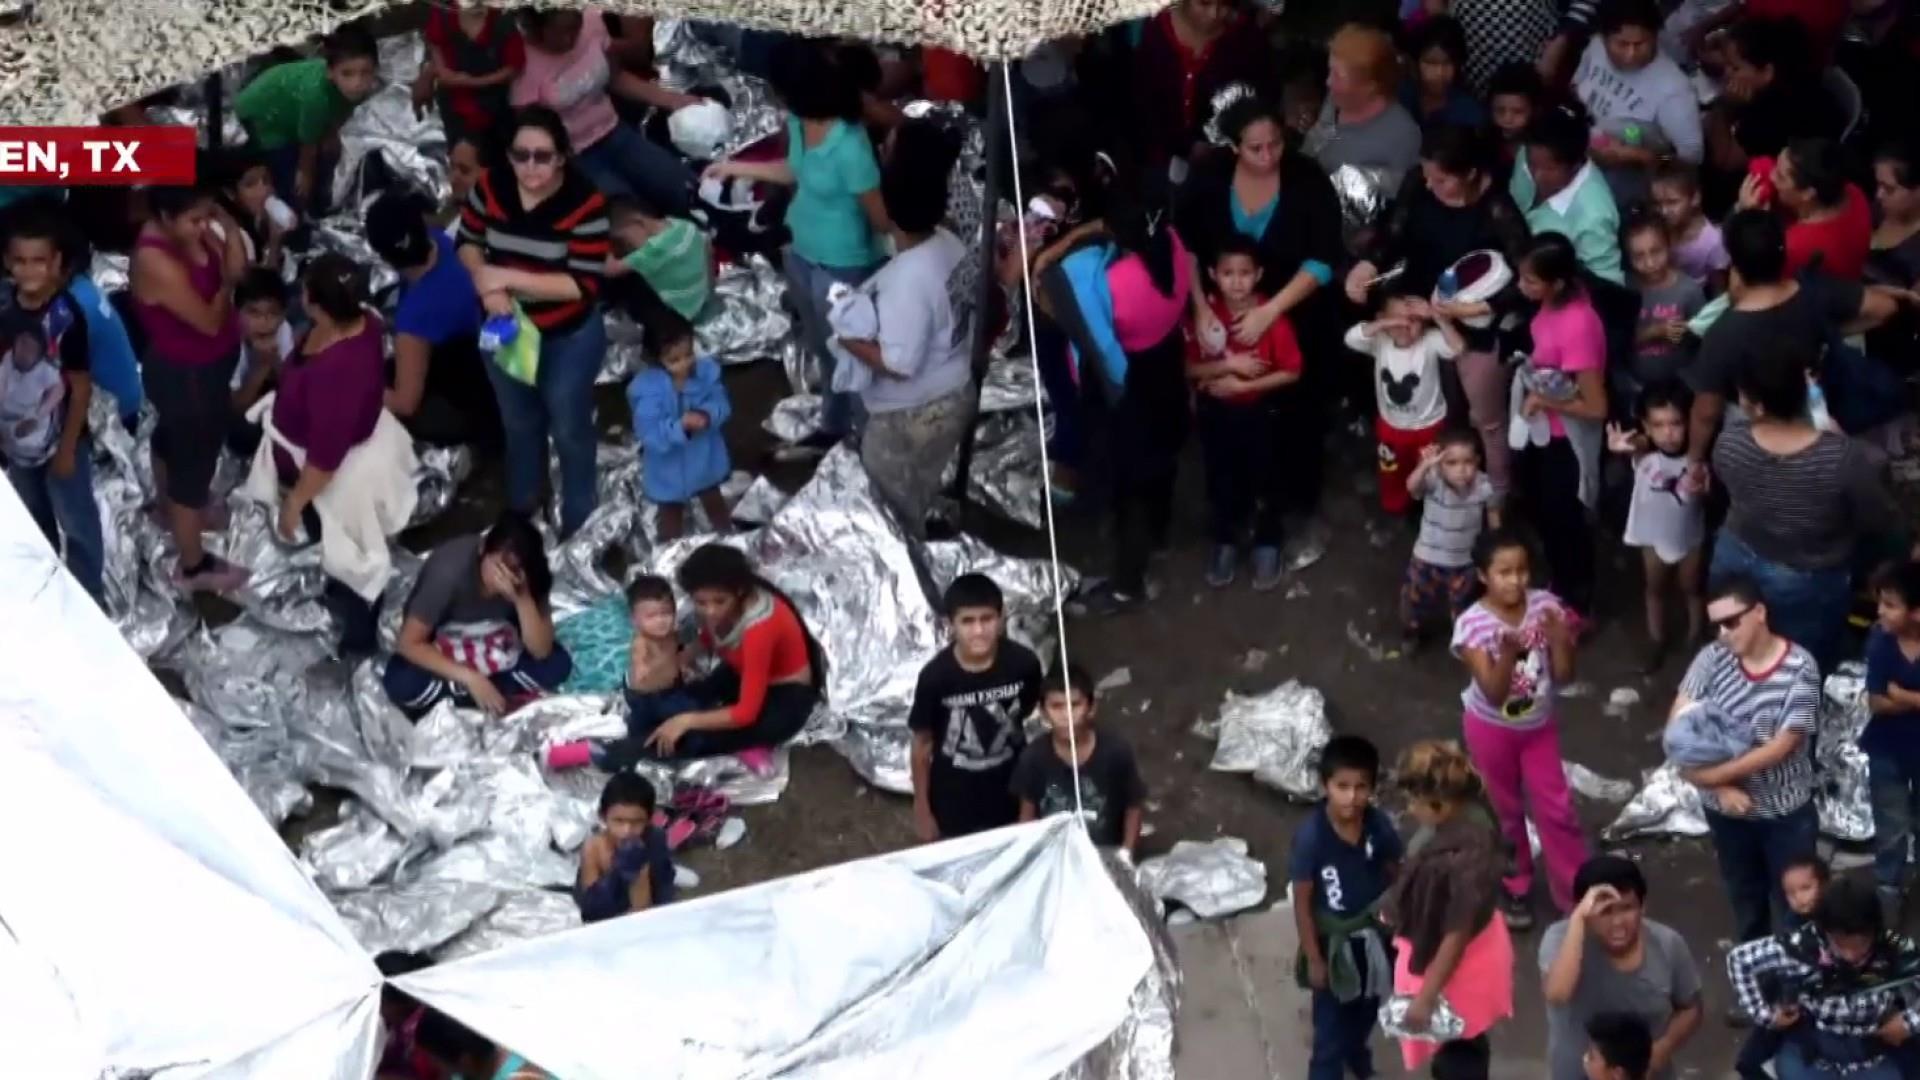 Trump defending conditions migrants are being held in